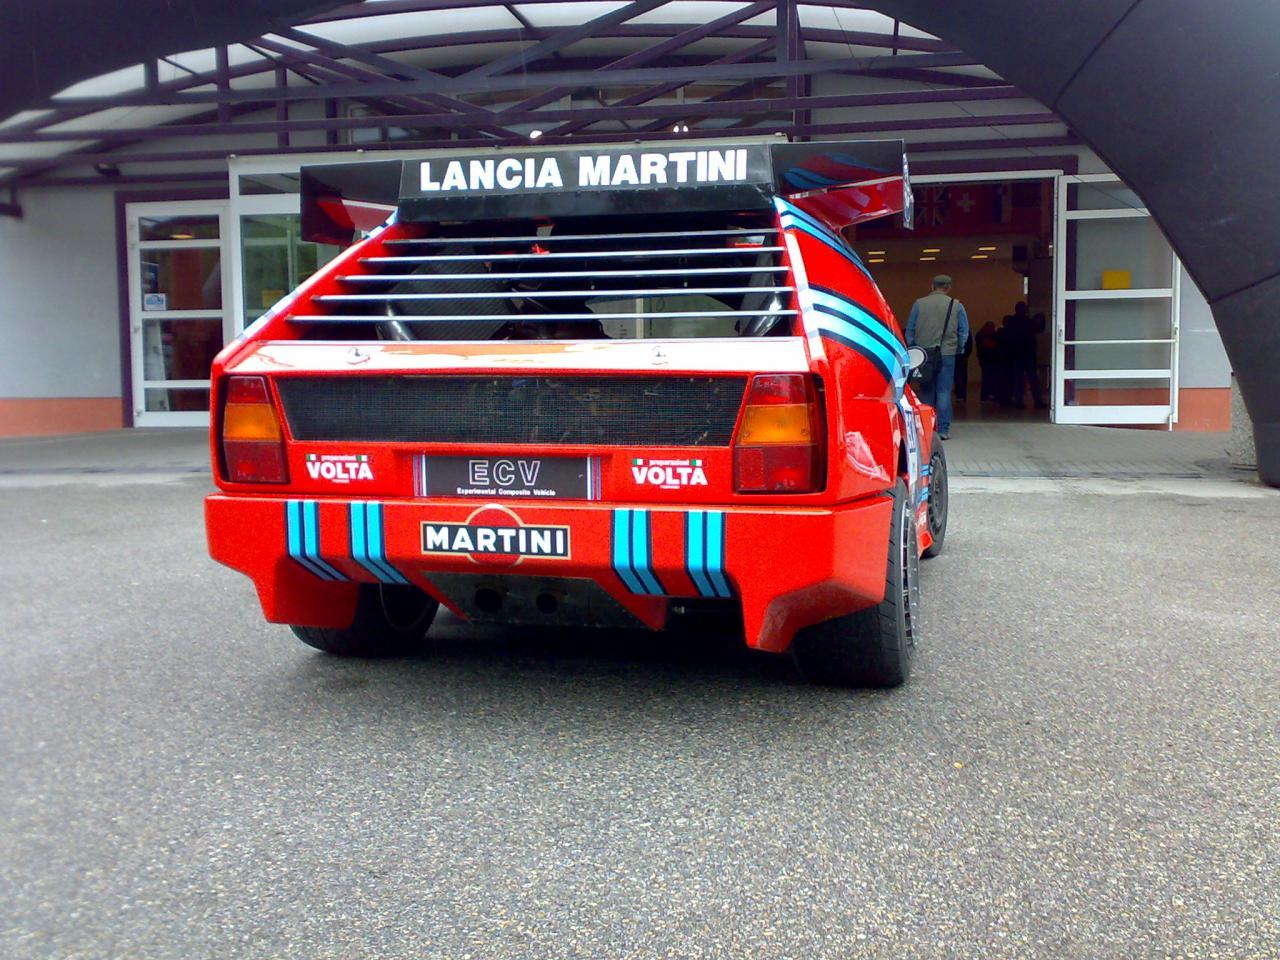 Lancia Ecv Ecv 2 Se042 Group S Prototypes Rally